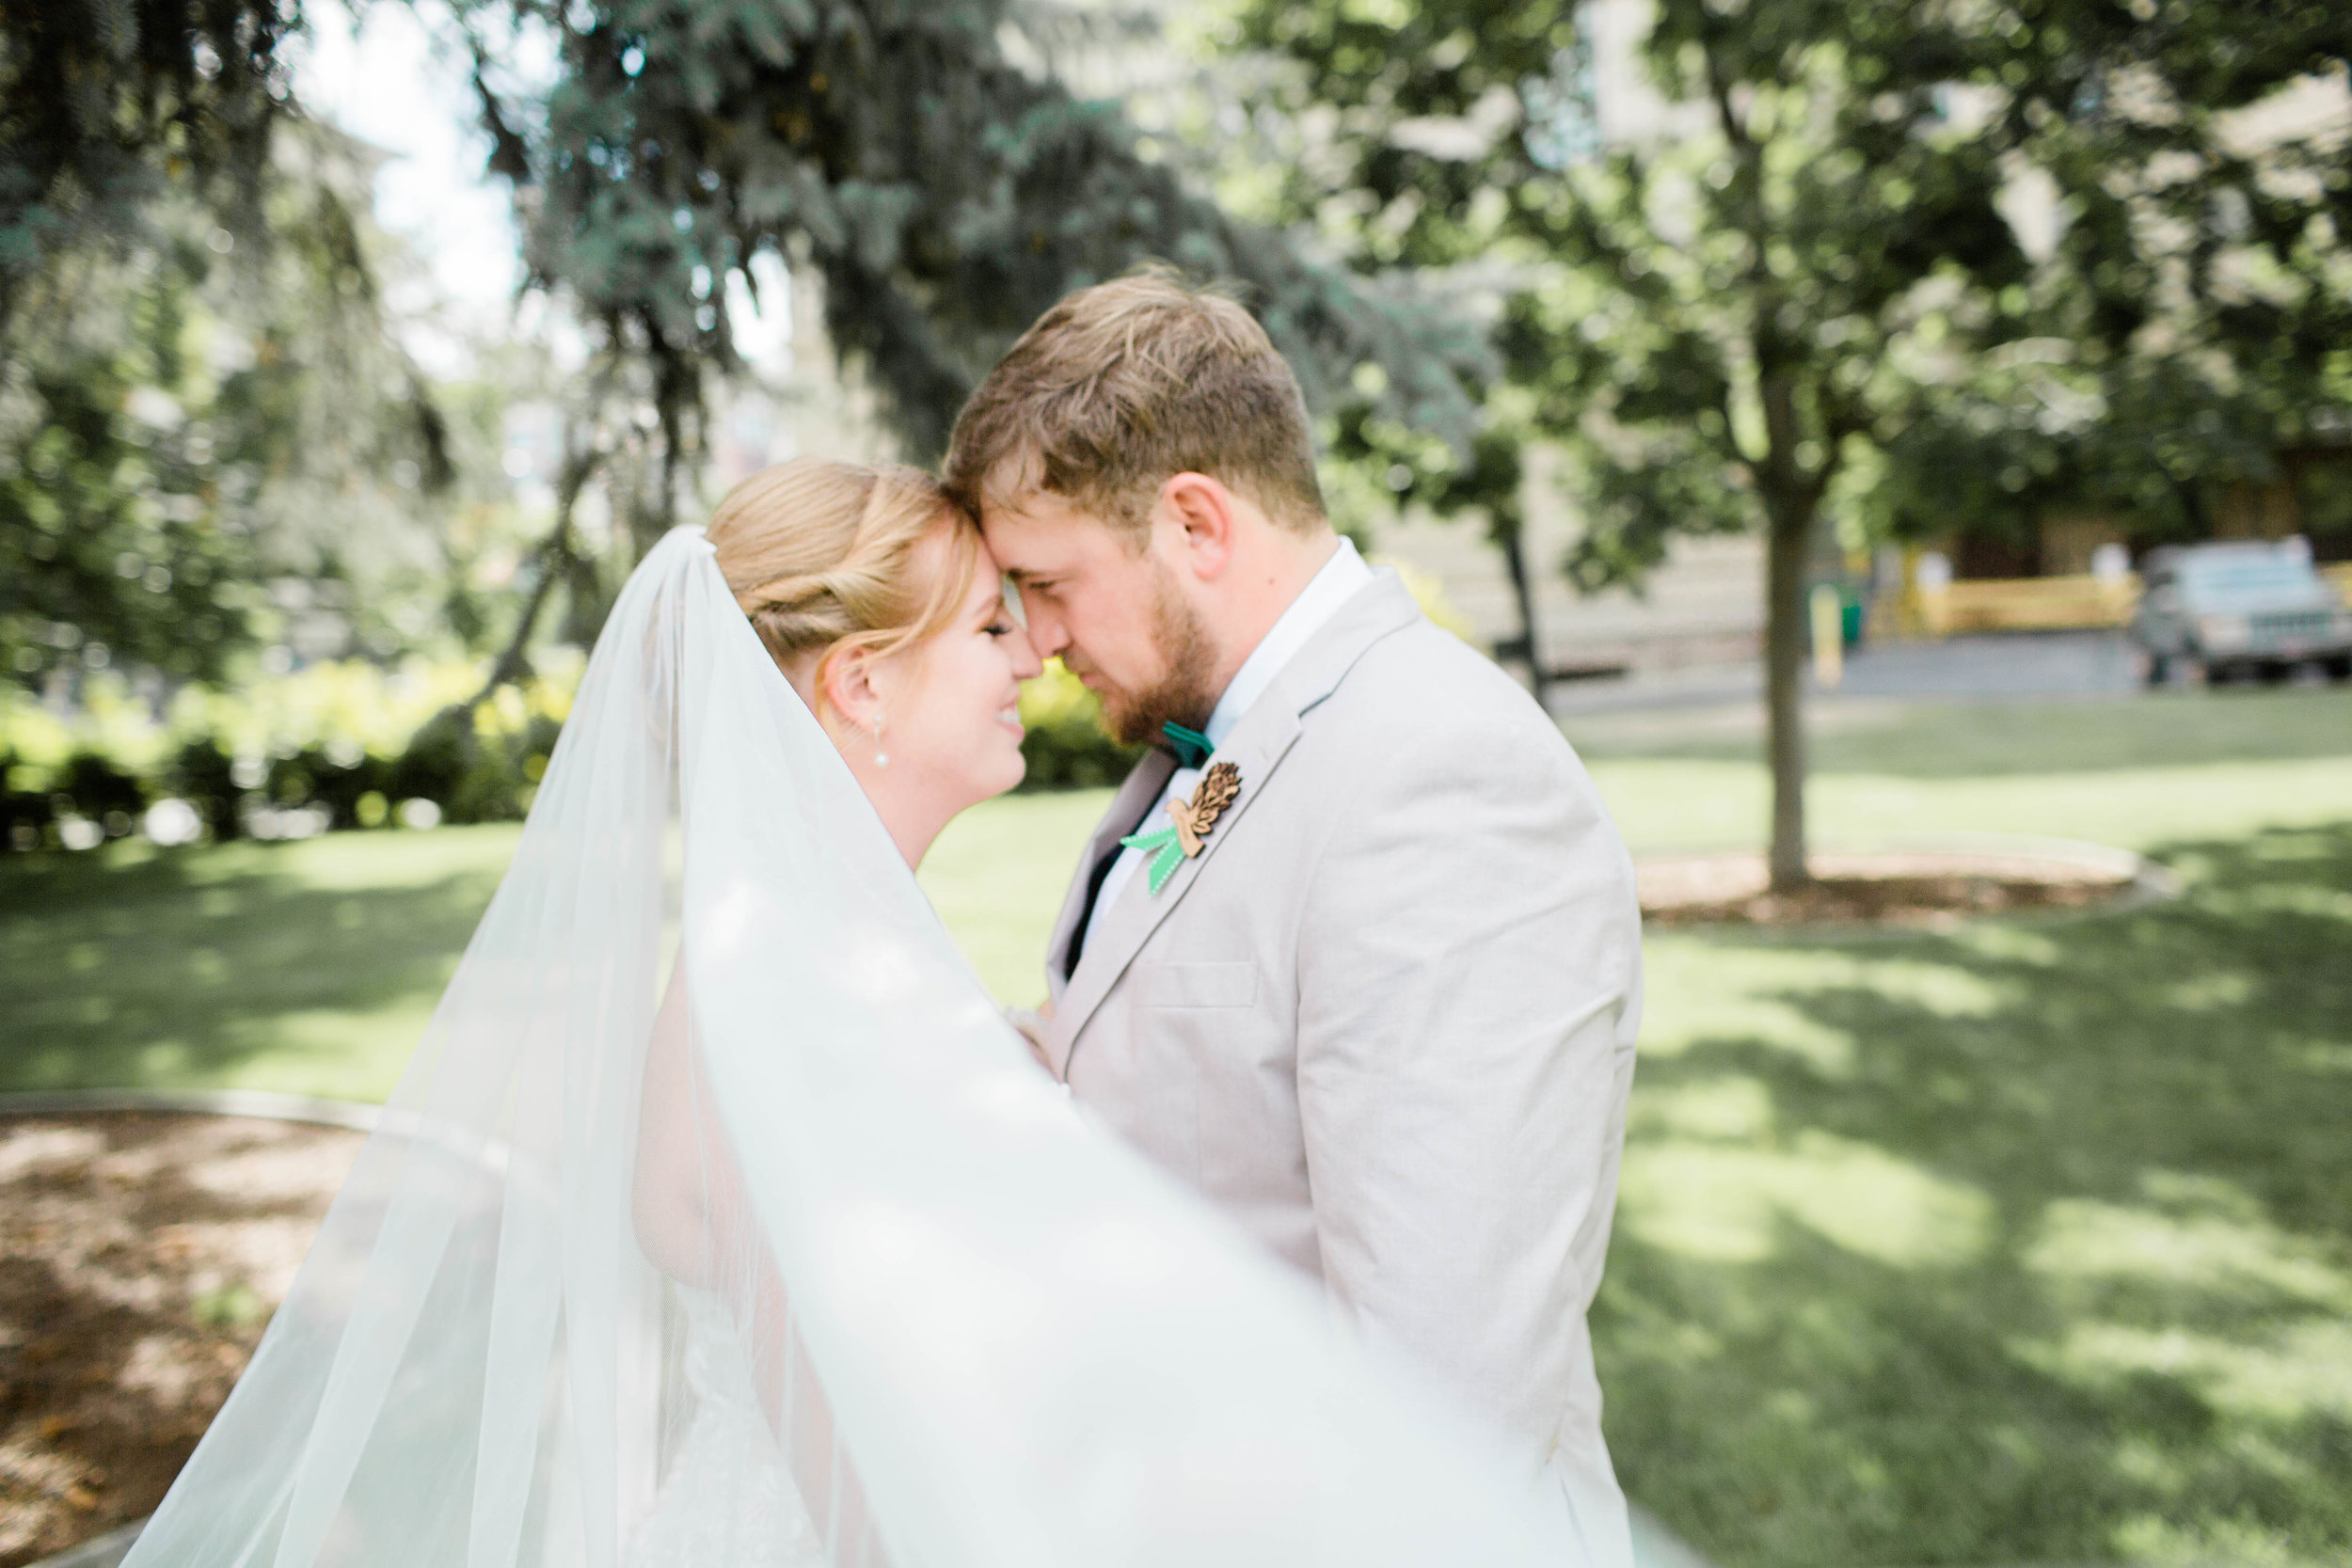 C-Lydia-Rohan-Downtown-Boise-Wedding-65.jpg